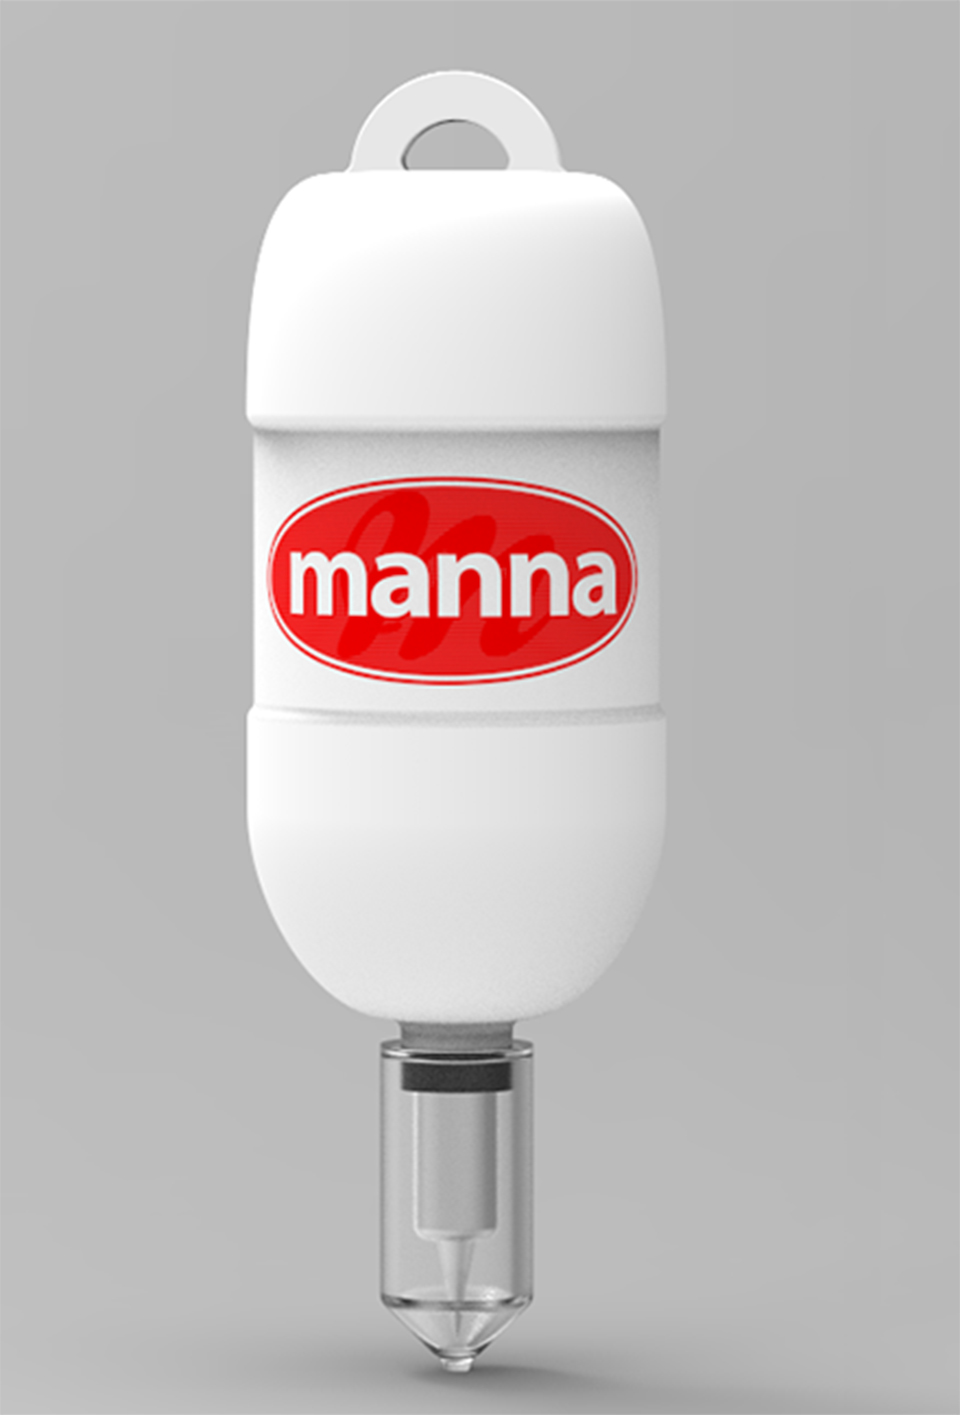 Manna02